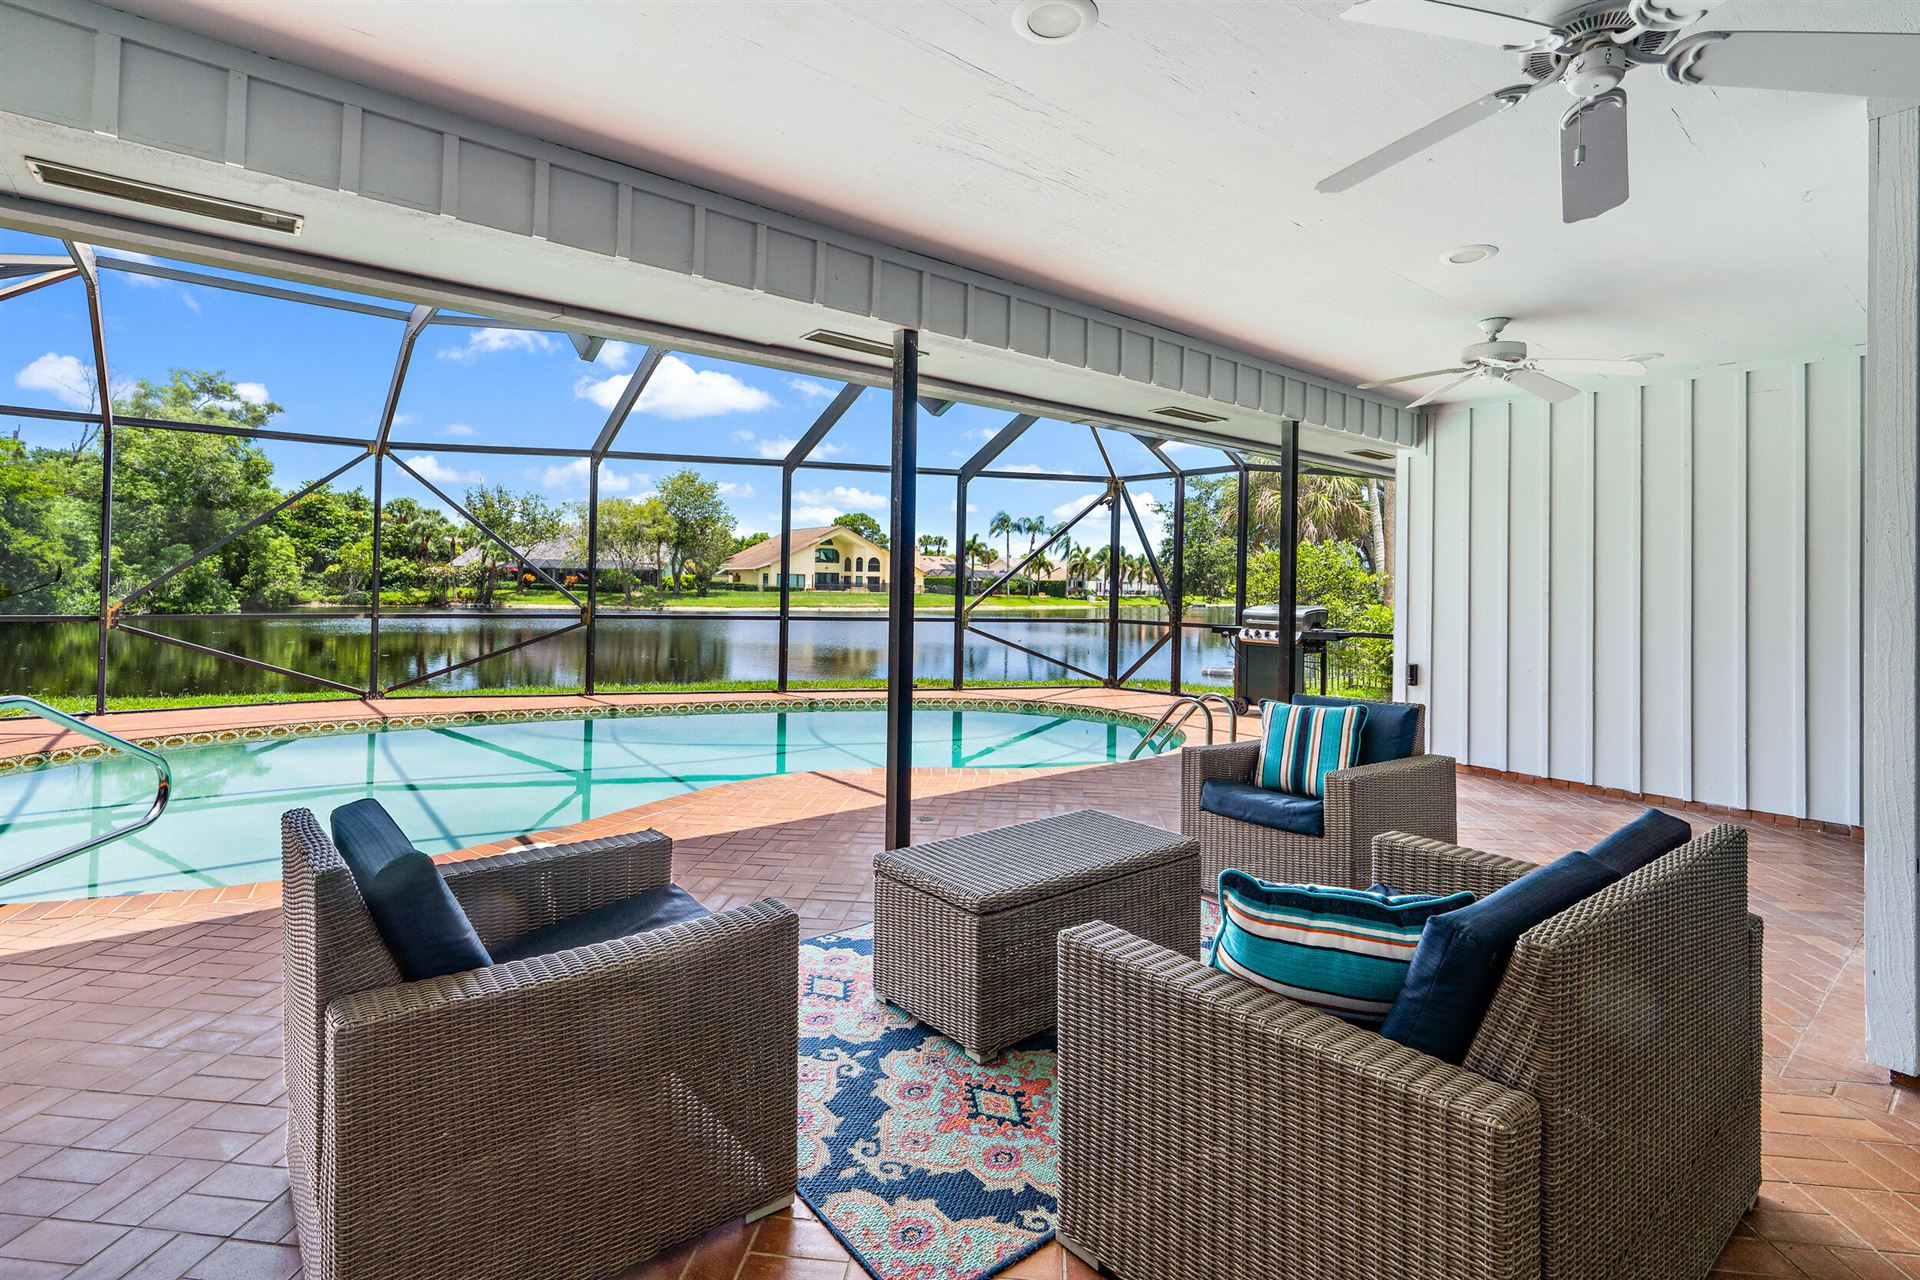 12896 La Rochelle Circle, Palm Beach Gardens, FL 33410 - MLS#: RX-10728923